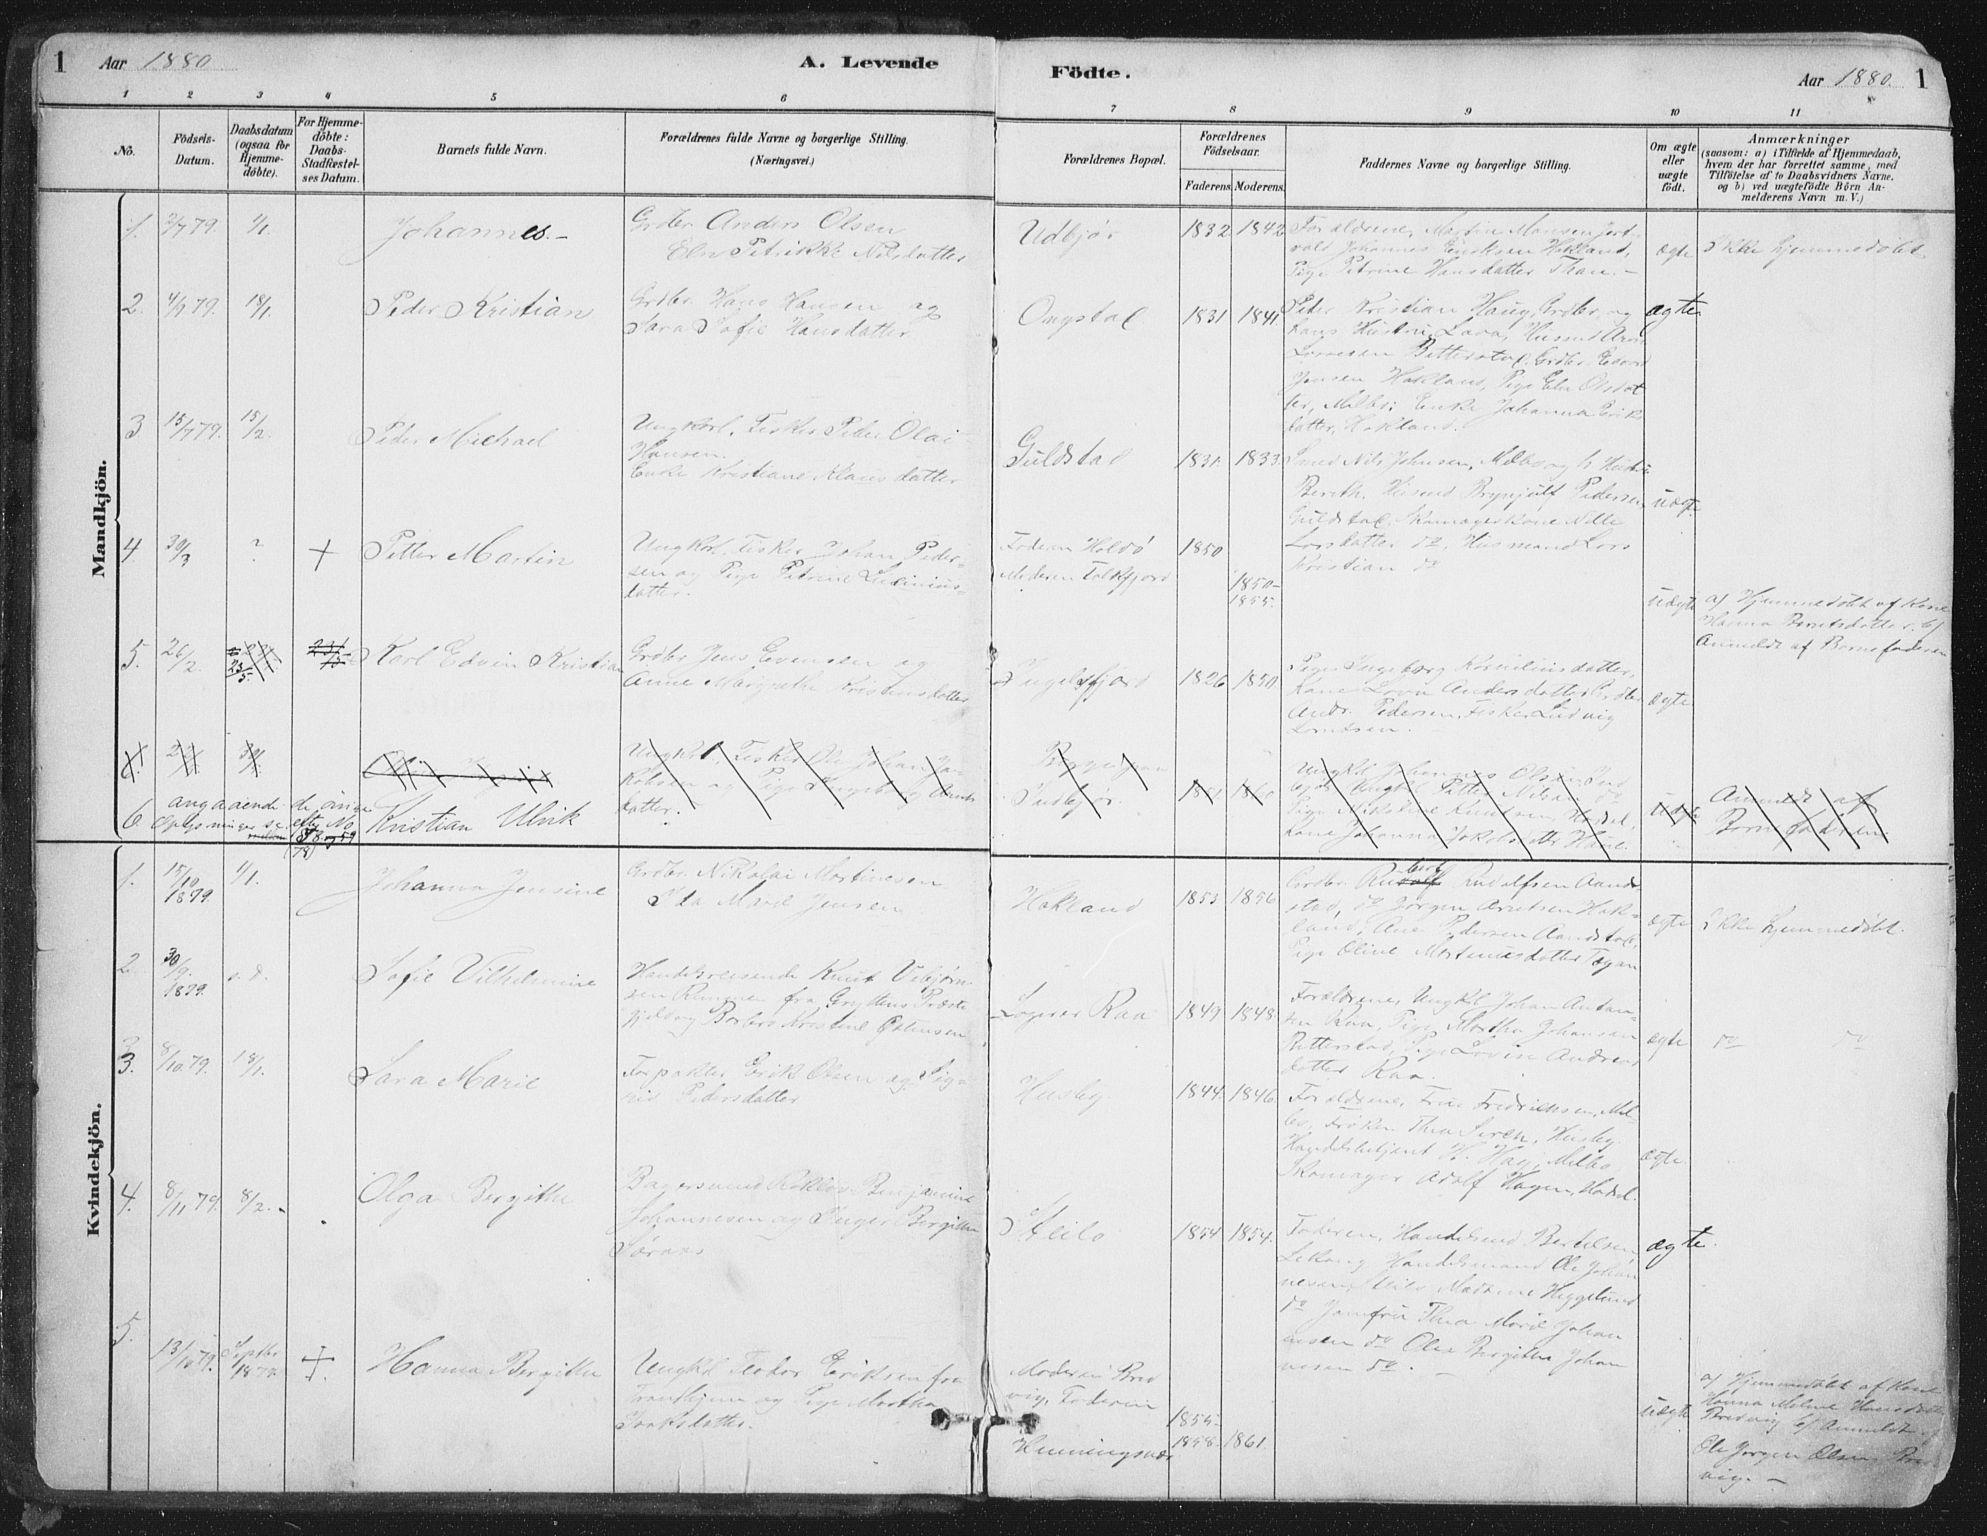 SAT, Ministerialprotokoller, klokkerbøker og fødselsregistre - Nordland, 888/L1244: Ministerialbok nr. 888A10, 1880-1890, s. 1